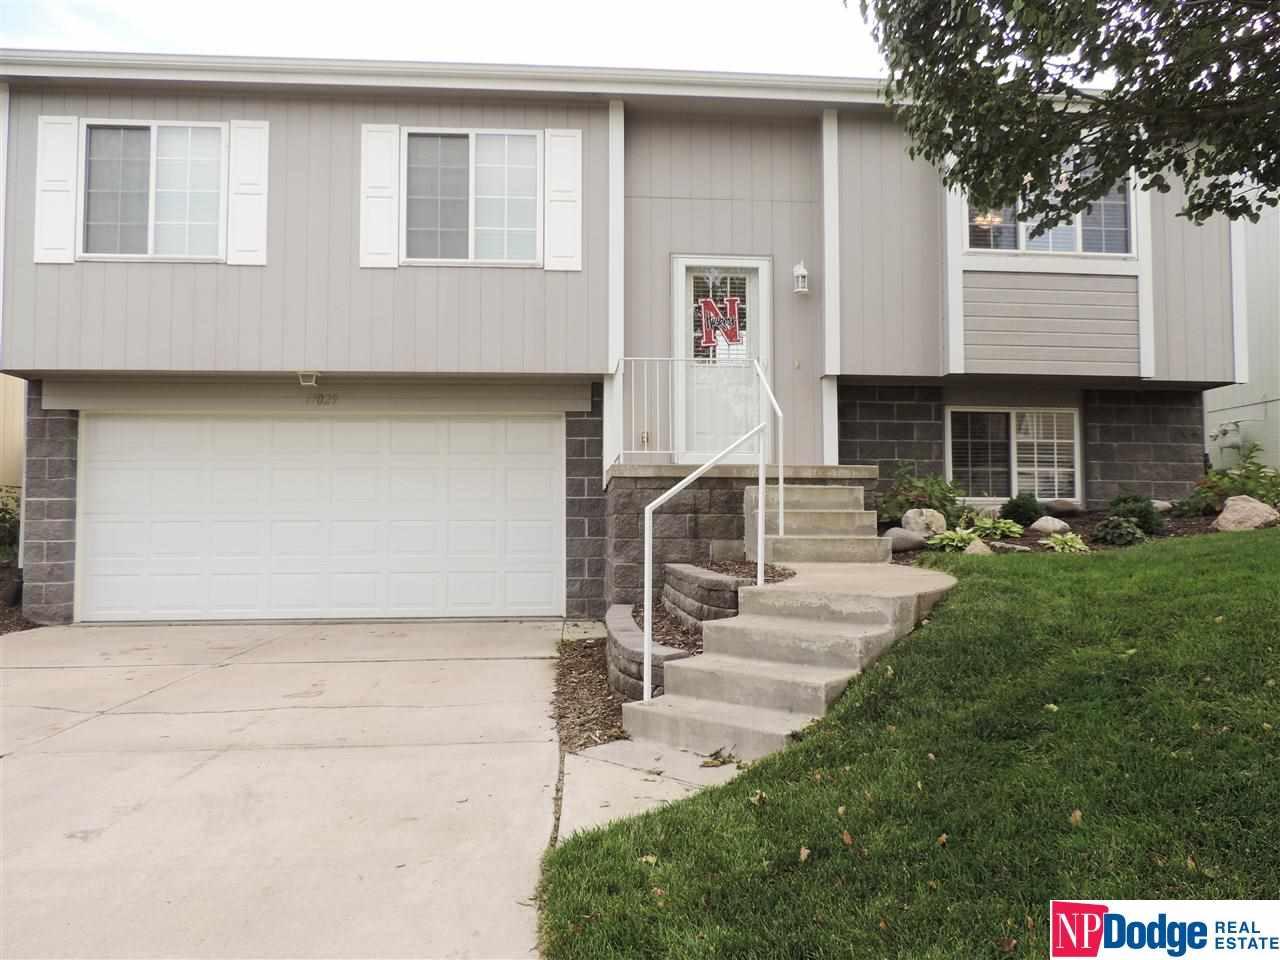 17029 Sprague Street, Omaha, NE 68116